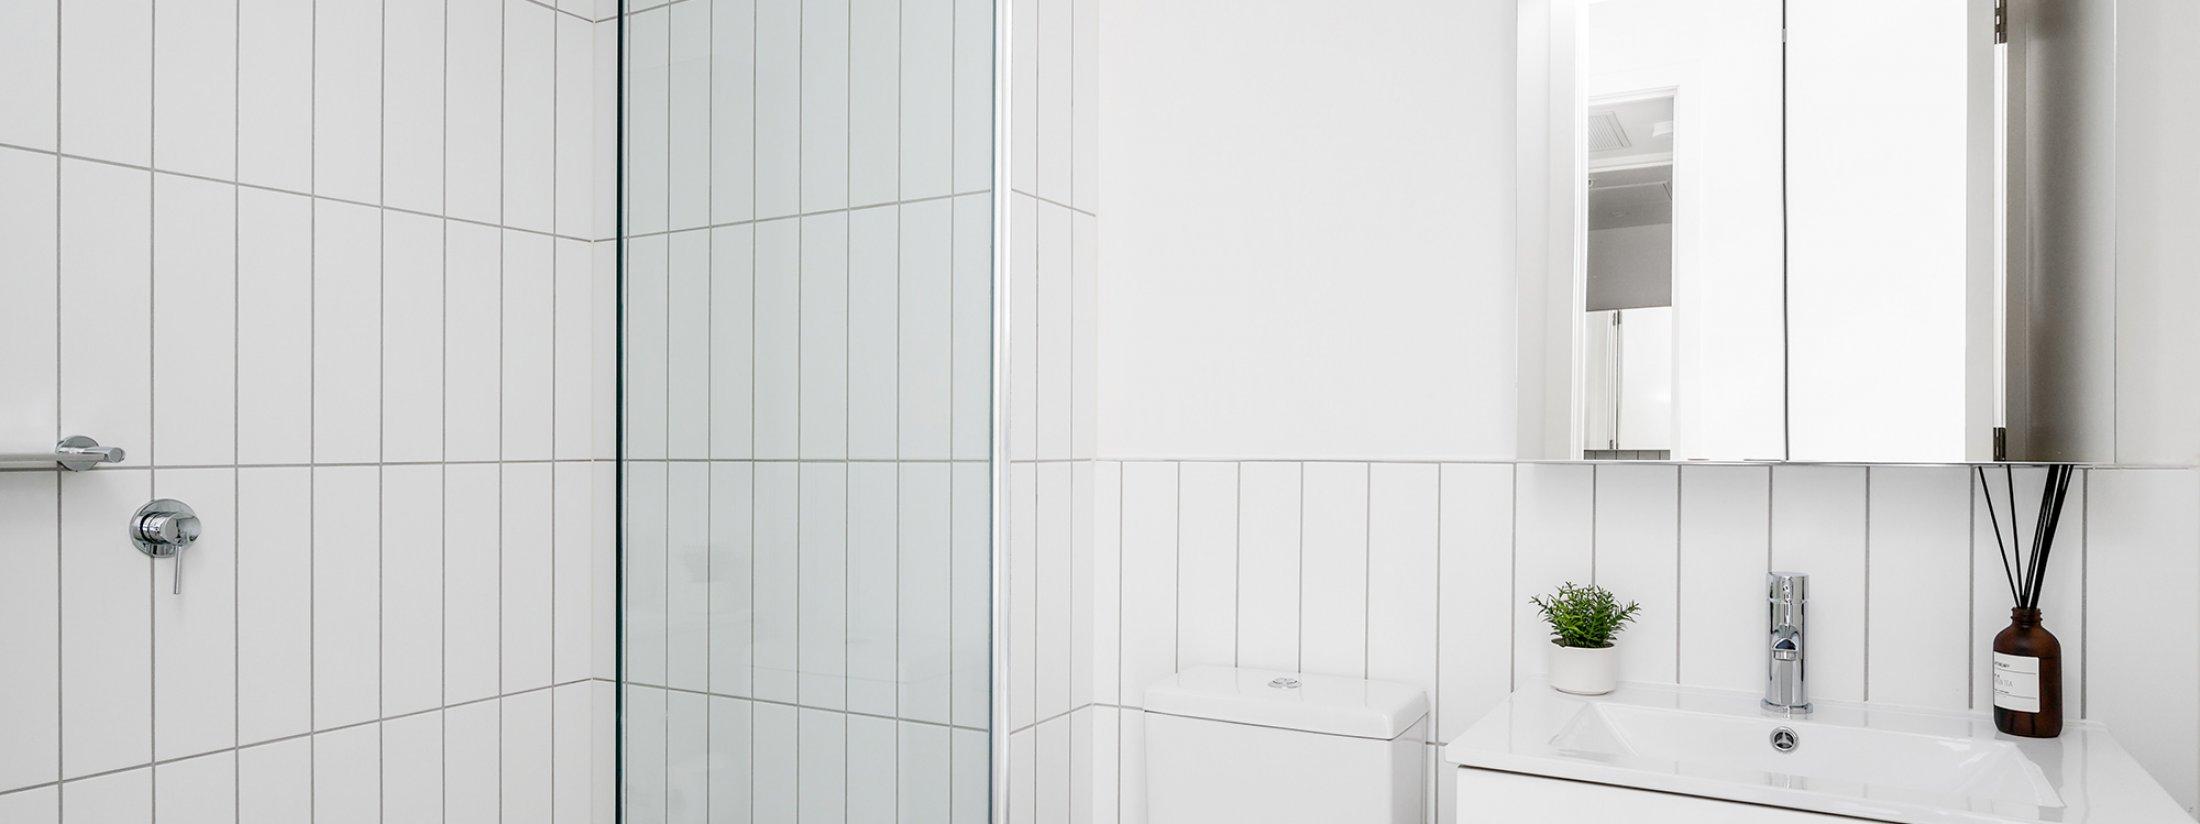 Axel Apartments - The Clarke - Glen Iris - Bathroom Shared